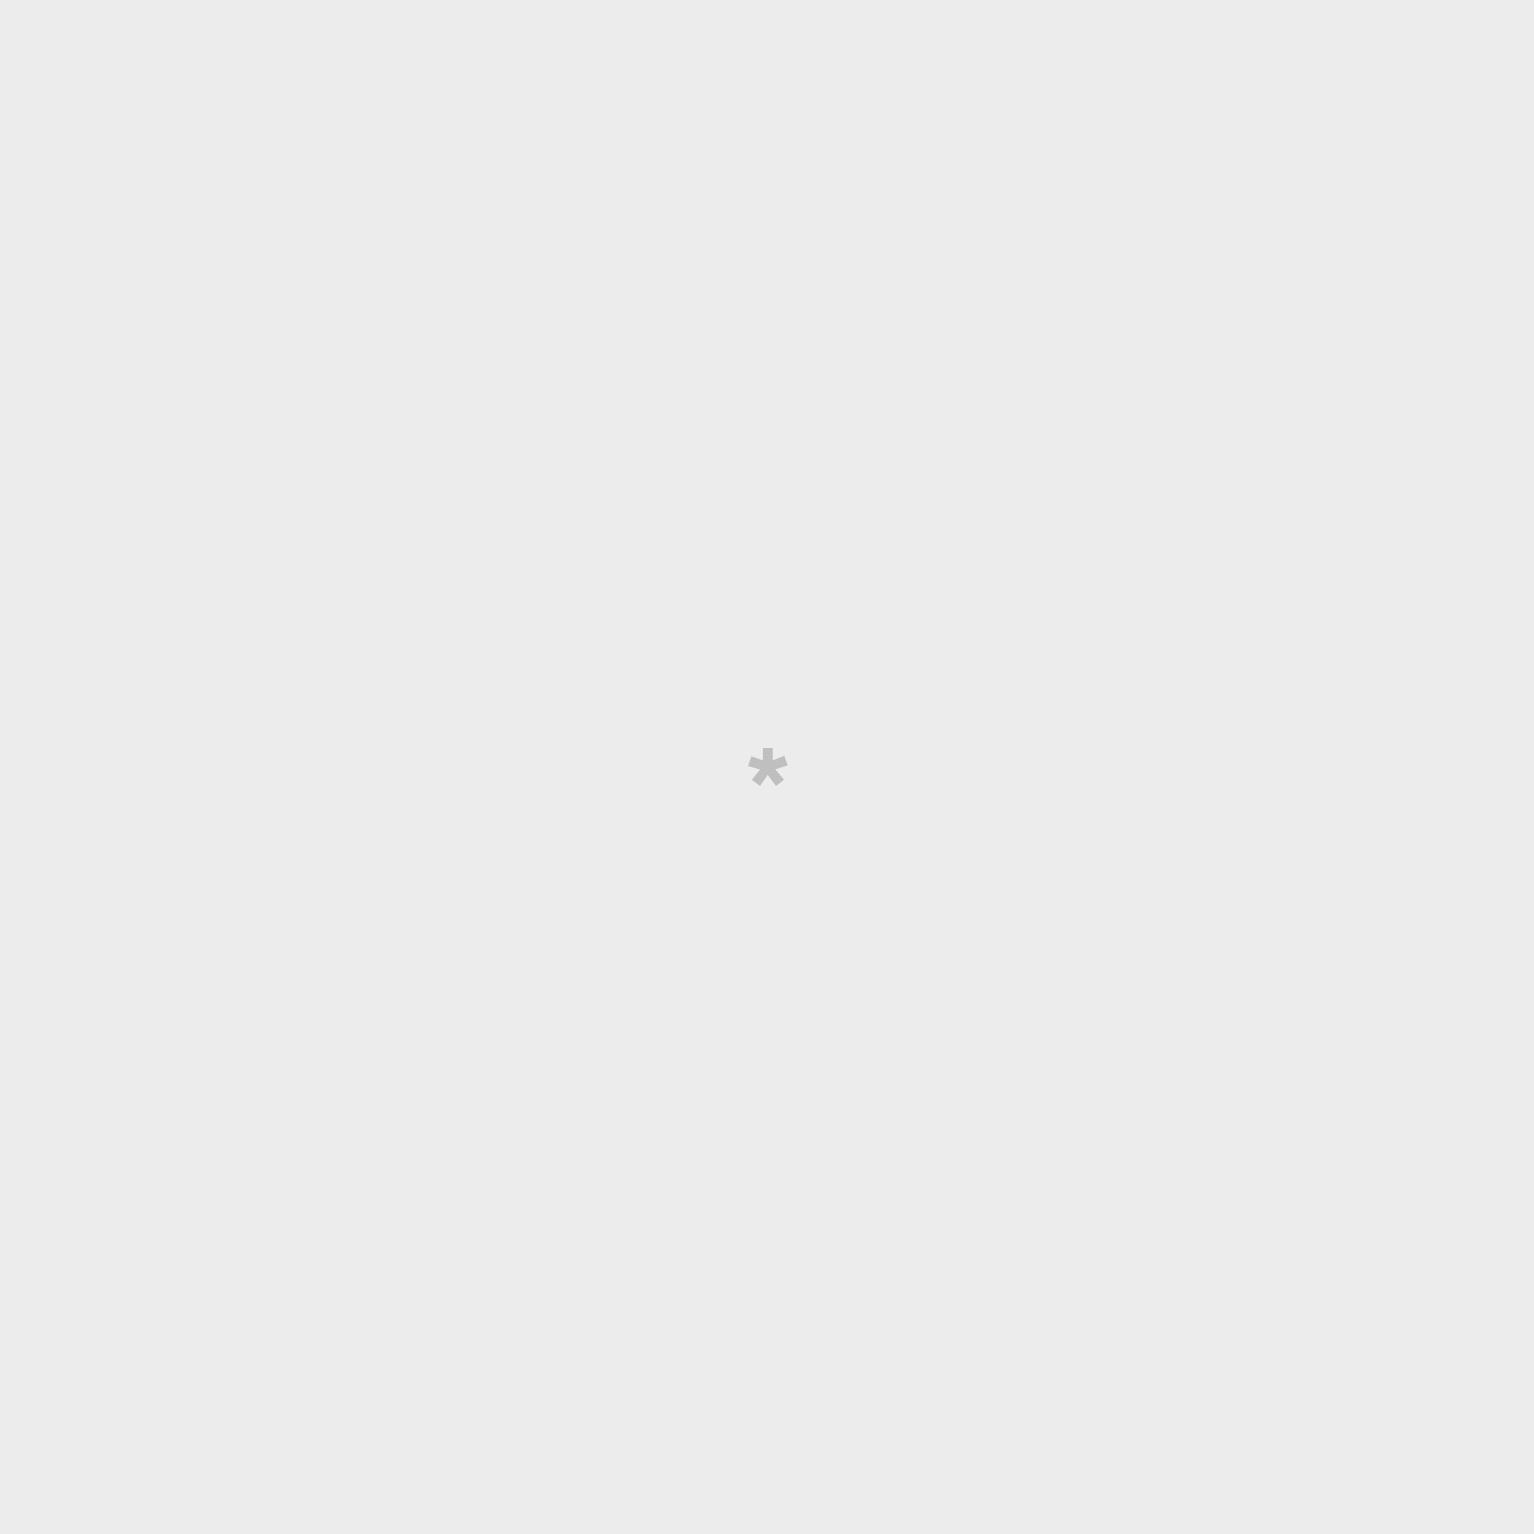 Zapatillas de casa talla única - Ni de aquí a Marte